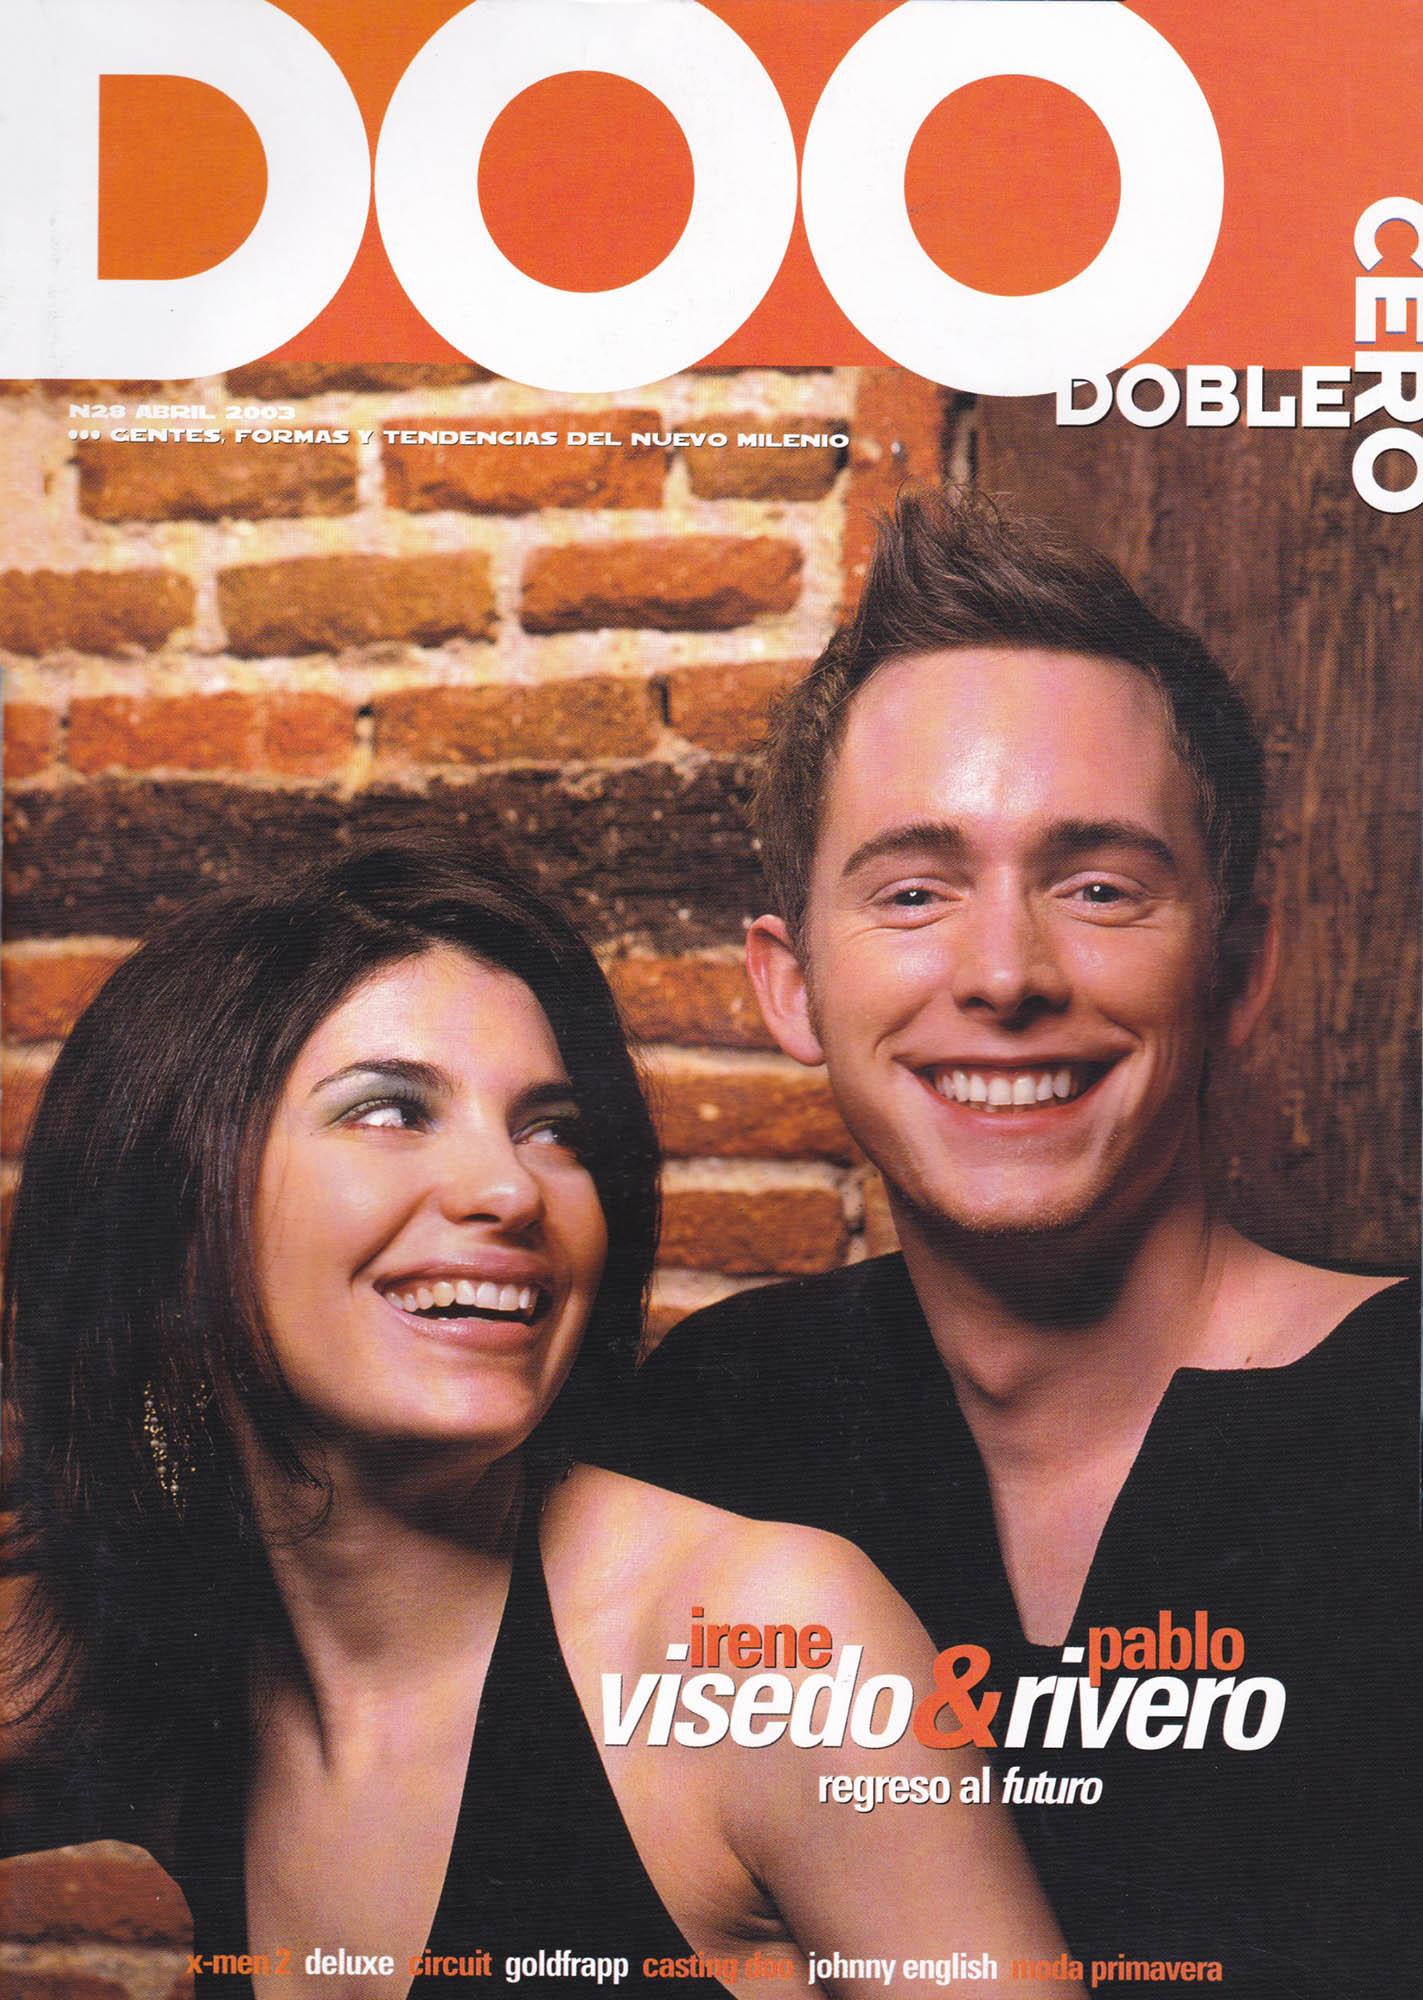 Irene Visedo & Pablo Rivero | Doblecero - El Corte Inglés | abr 2003